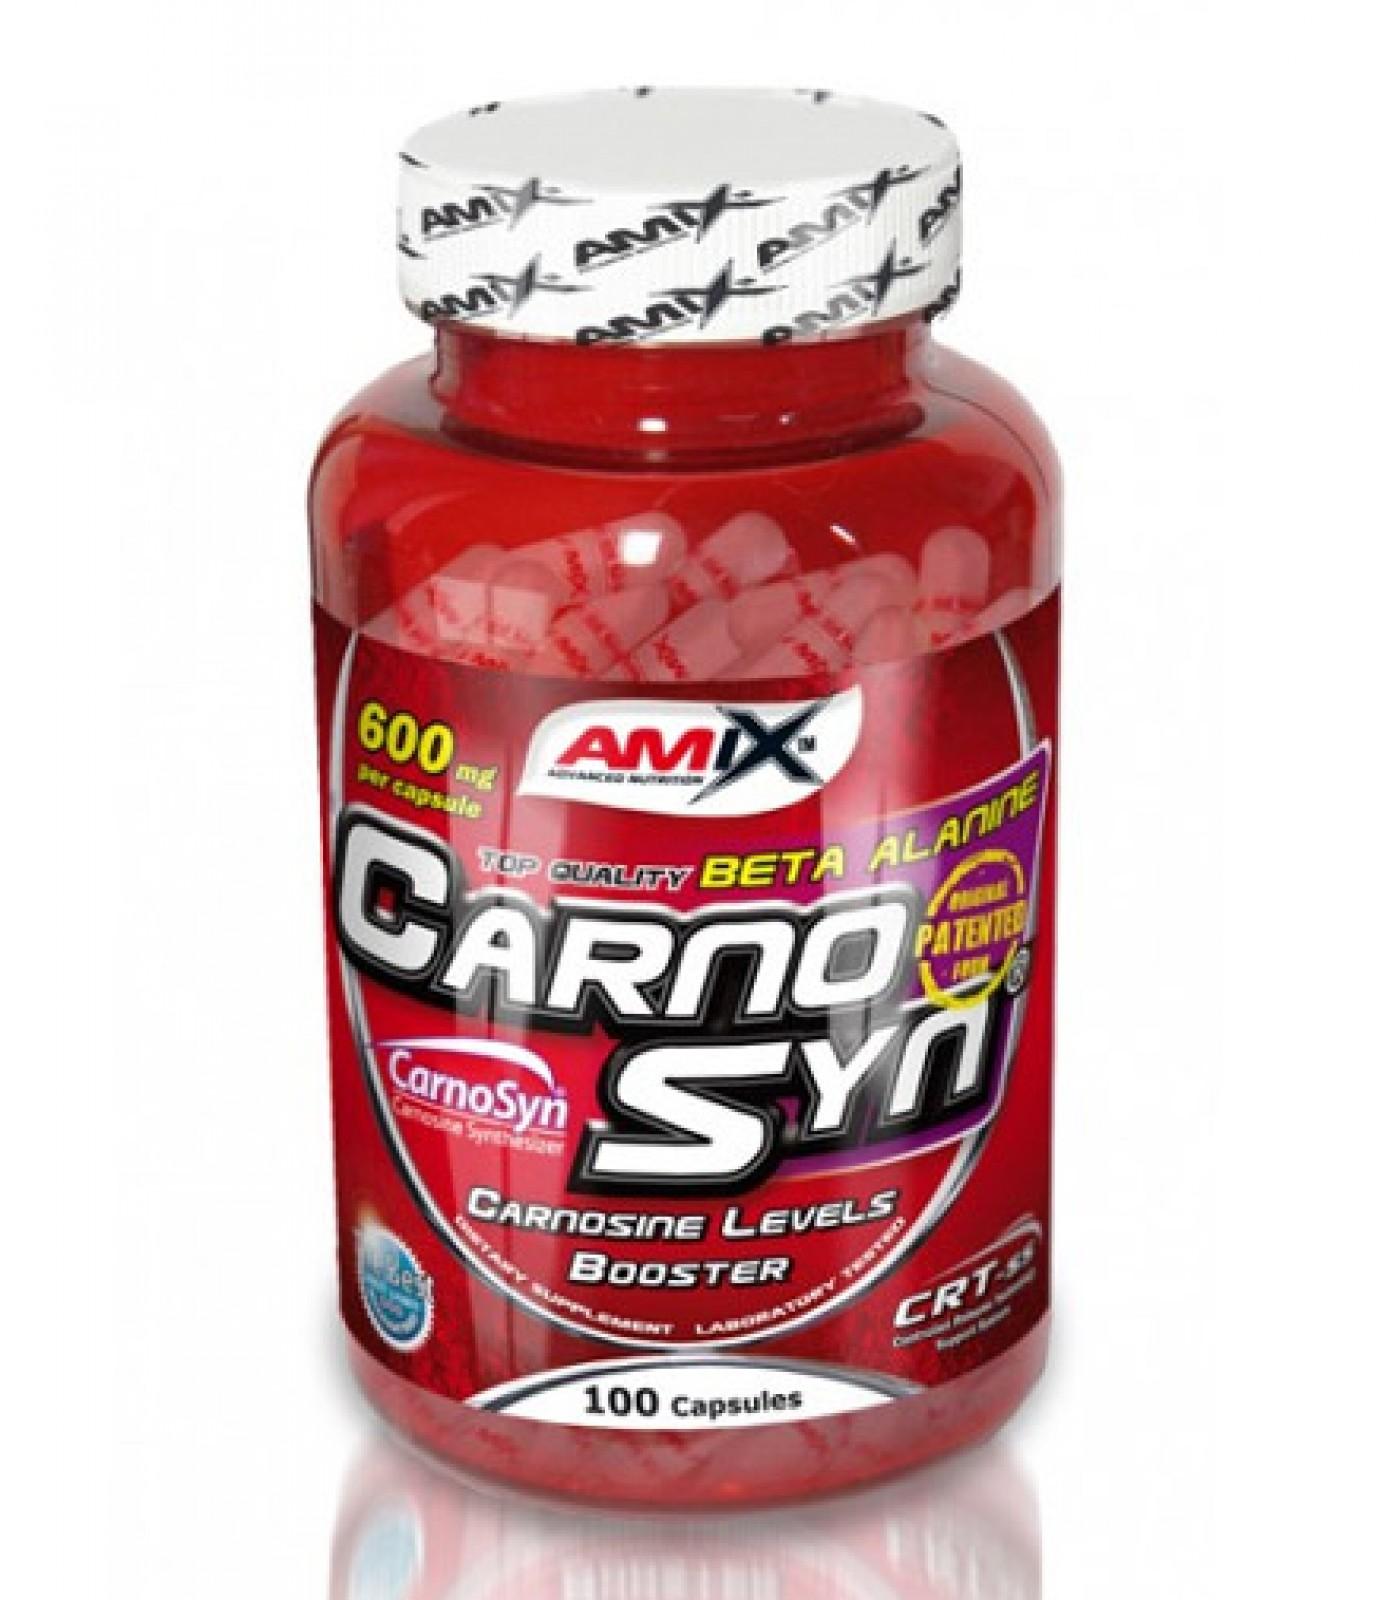 Amix - CarnoSyn ® (Beta-Alanine) / 100caps.